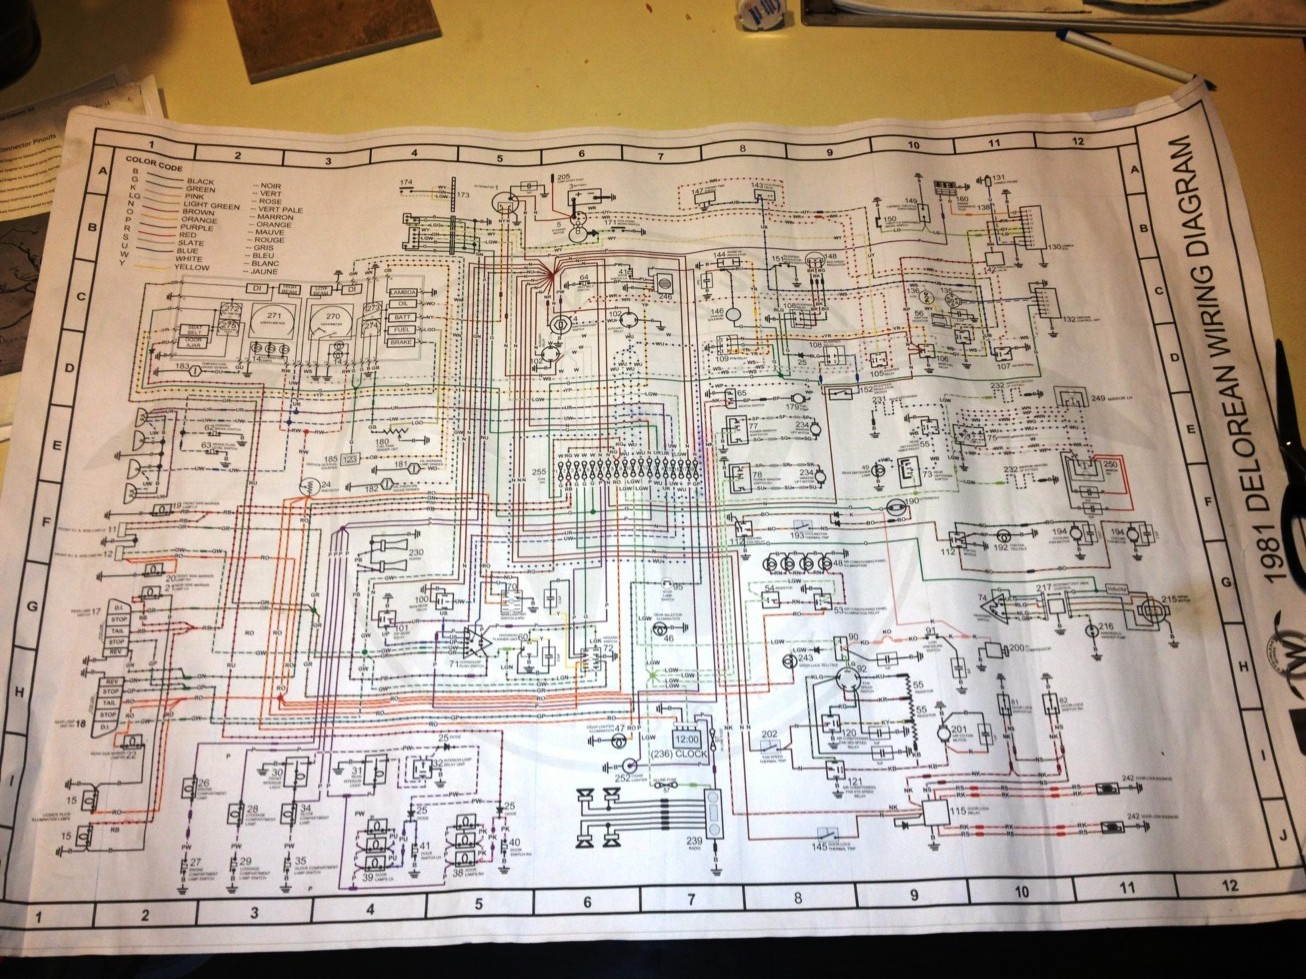 small resolution of delorean wiring diagrams images gallery ls1 delorean may 2012 rh ls1delorean com